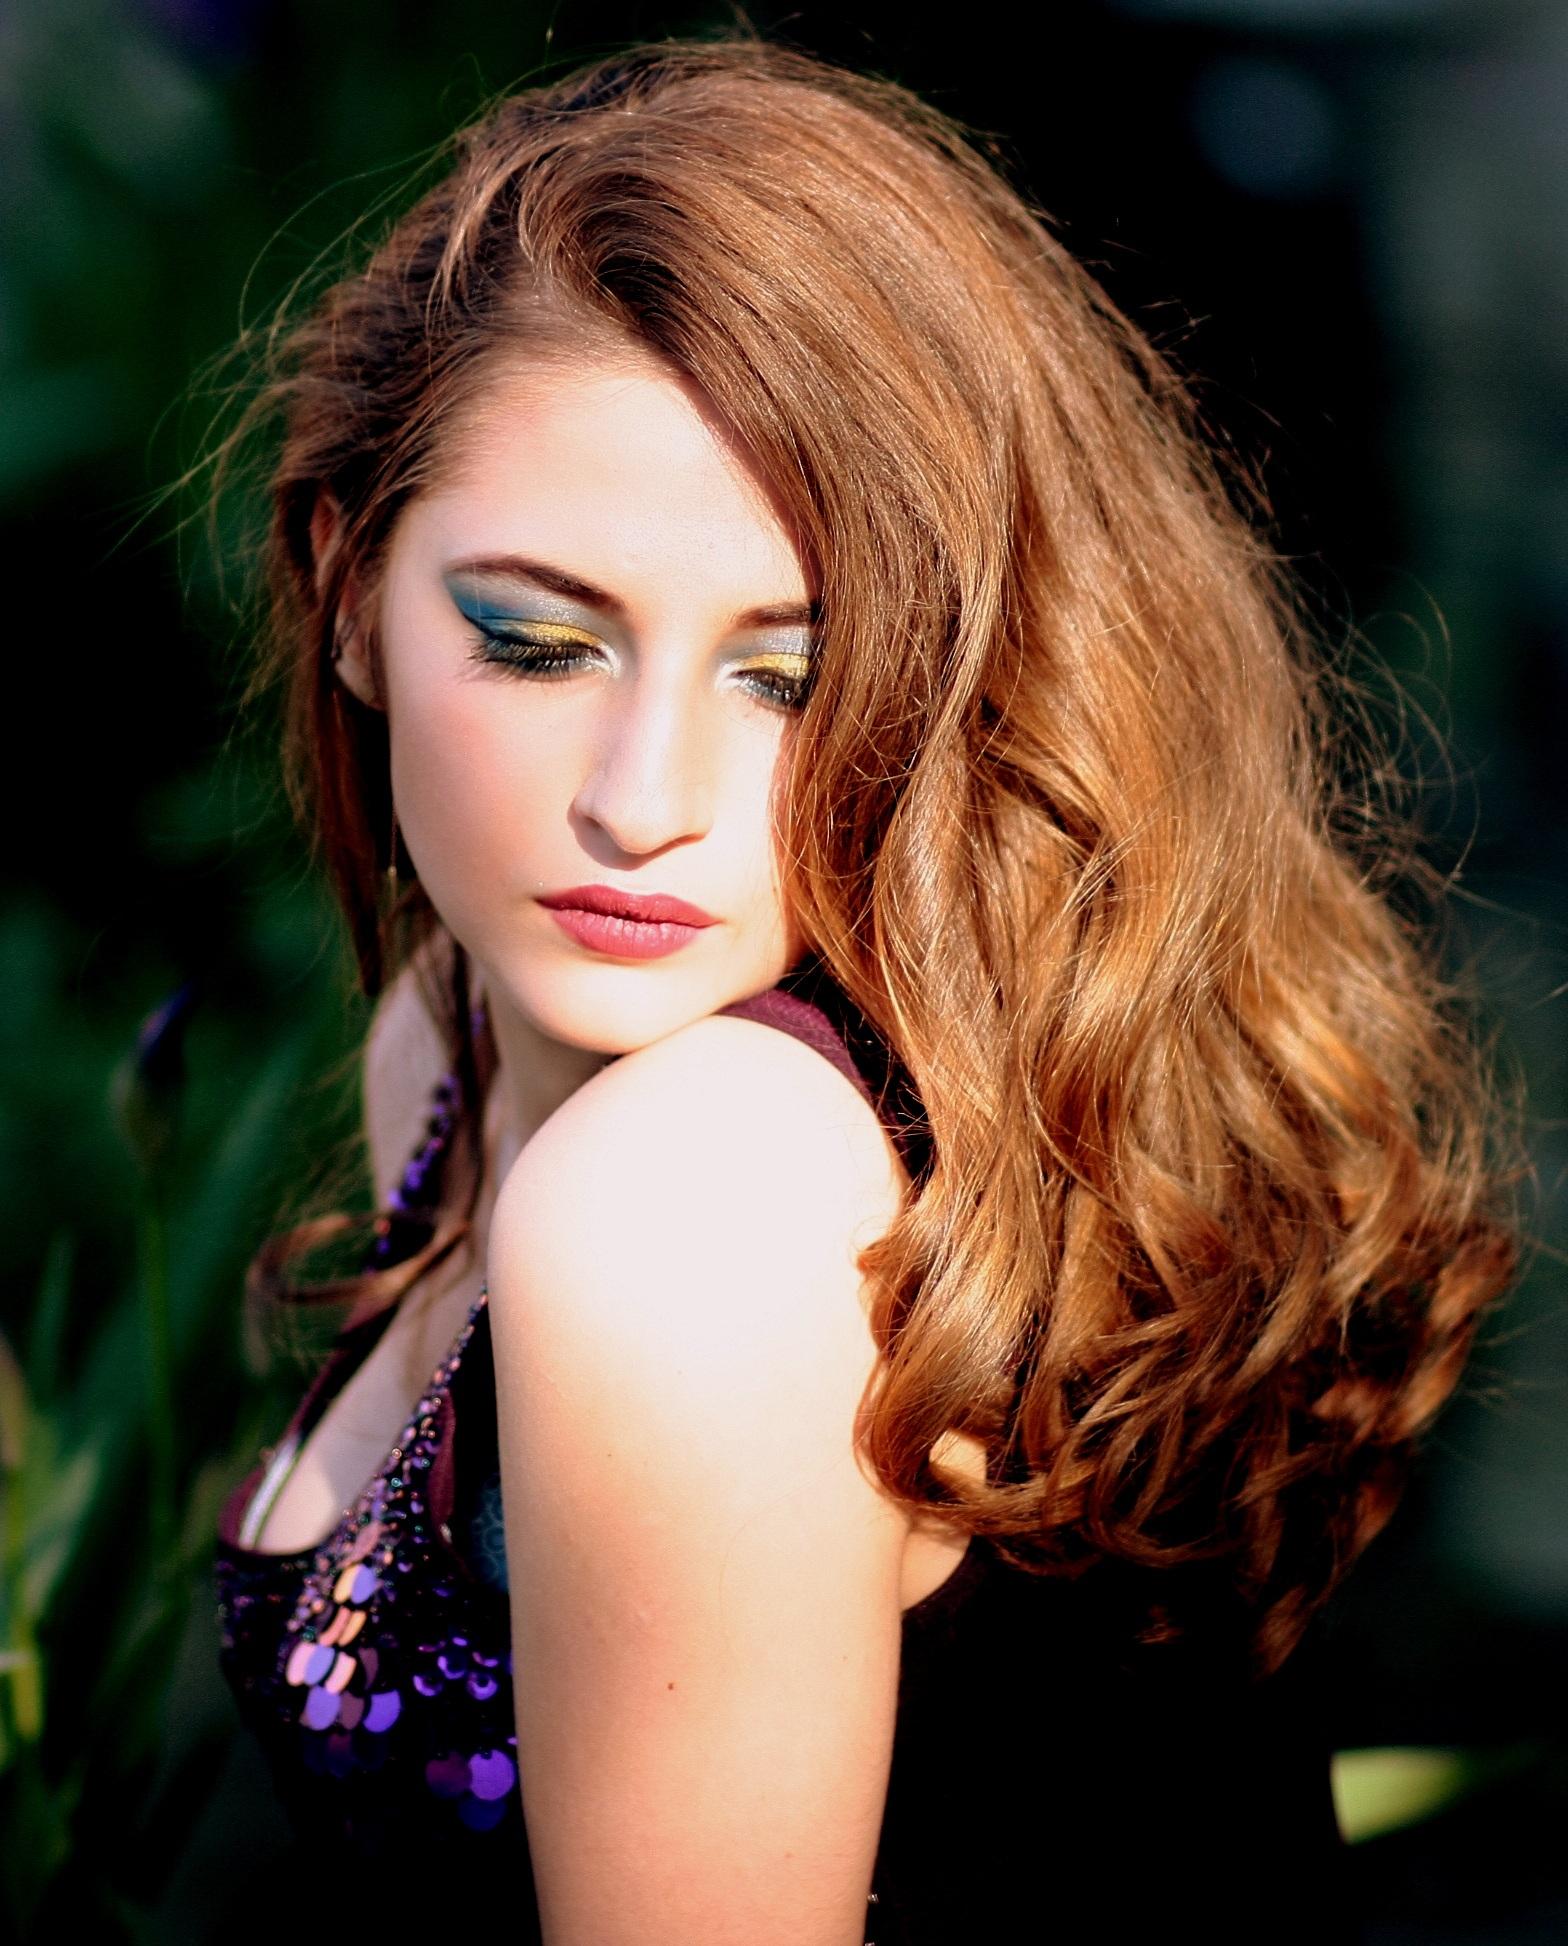 Free Images Girl Singer Model Fashion Blonde Lip Hairstyle